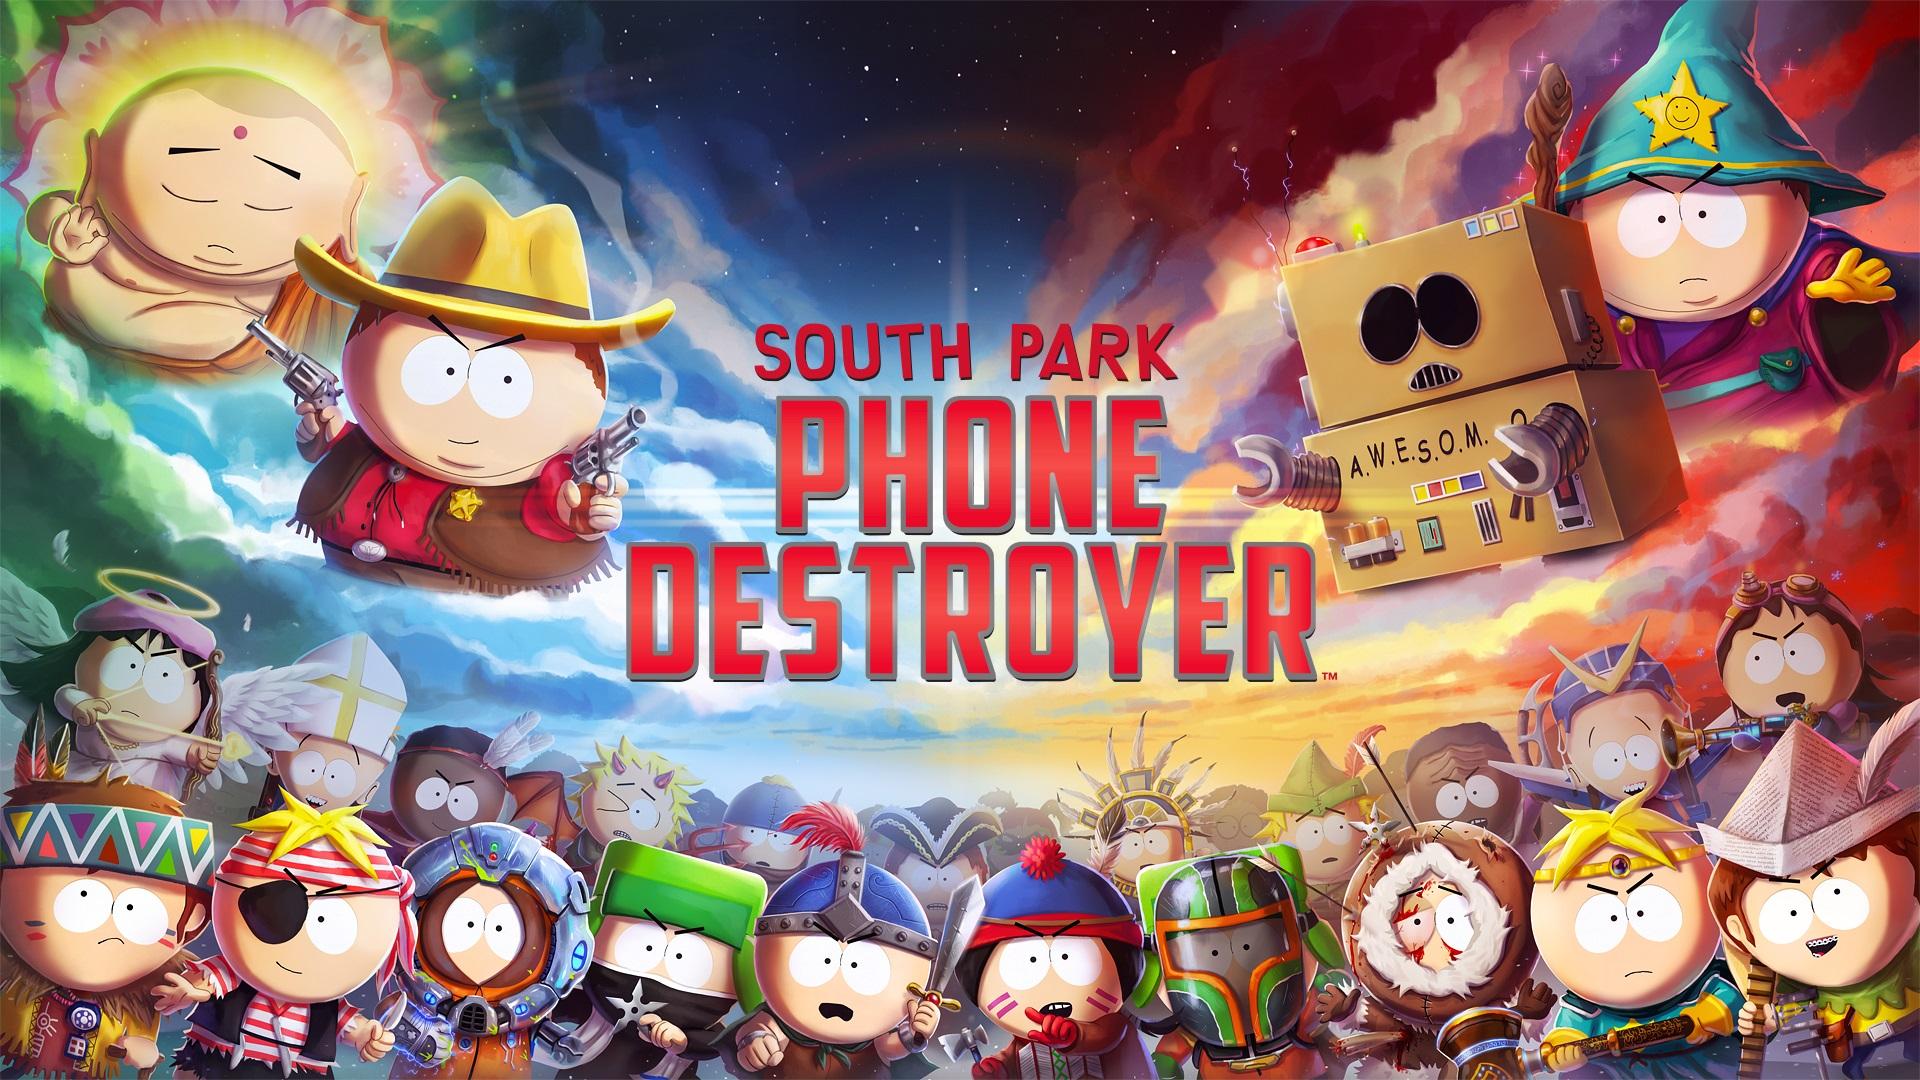 south-park-phone-destroyer-nat-games-logo-wallpaper-artwork-e3